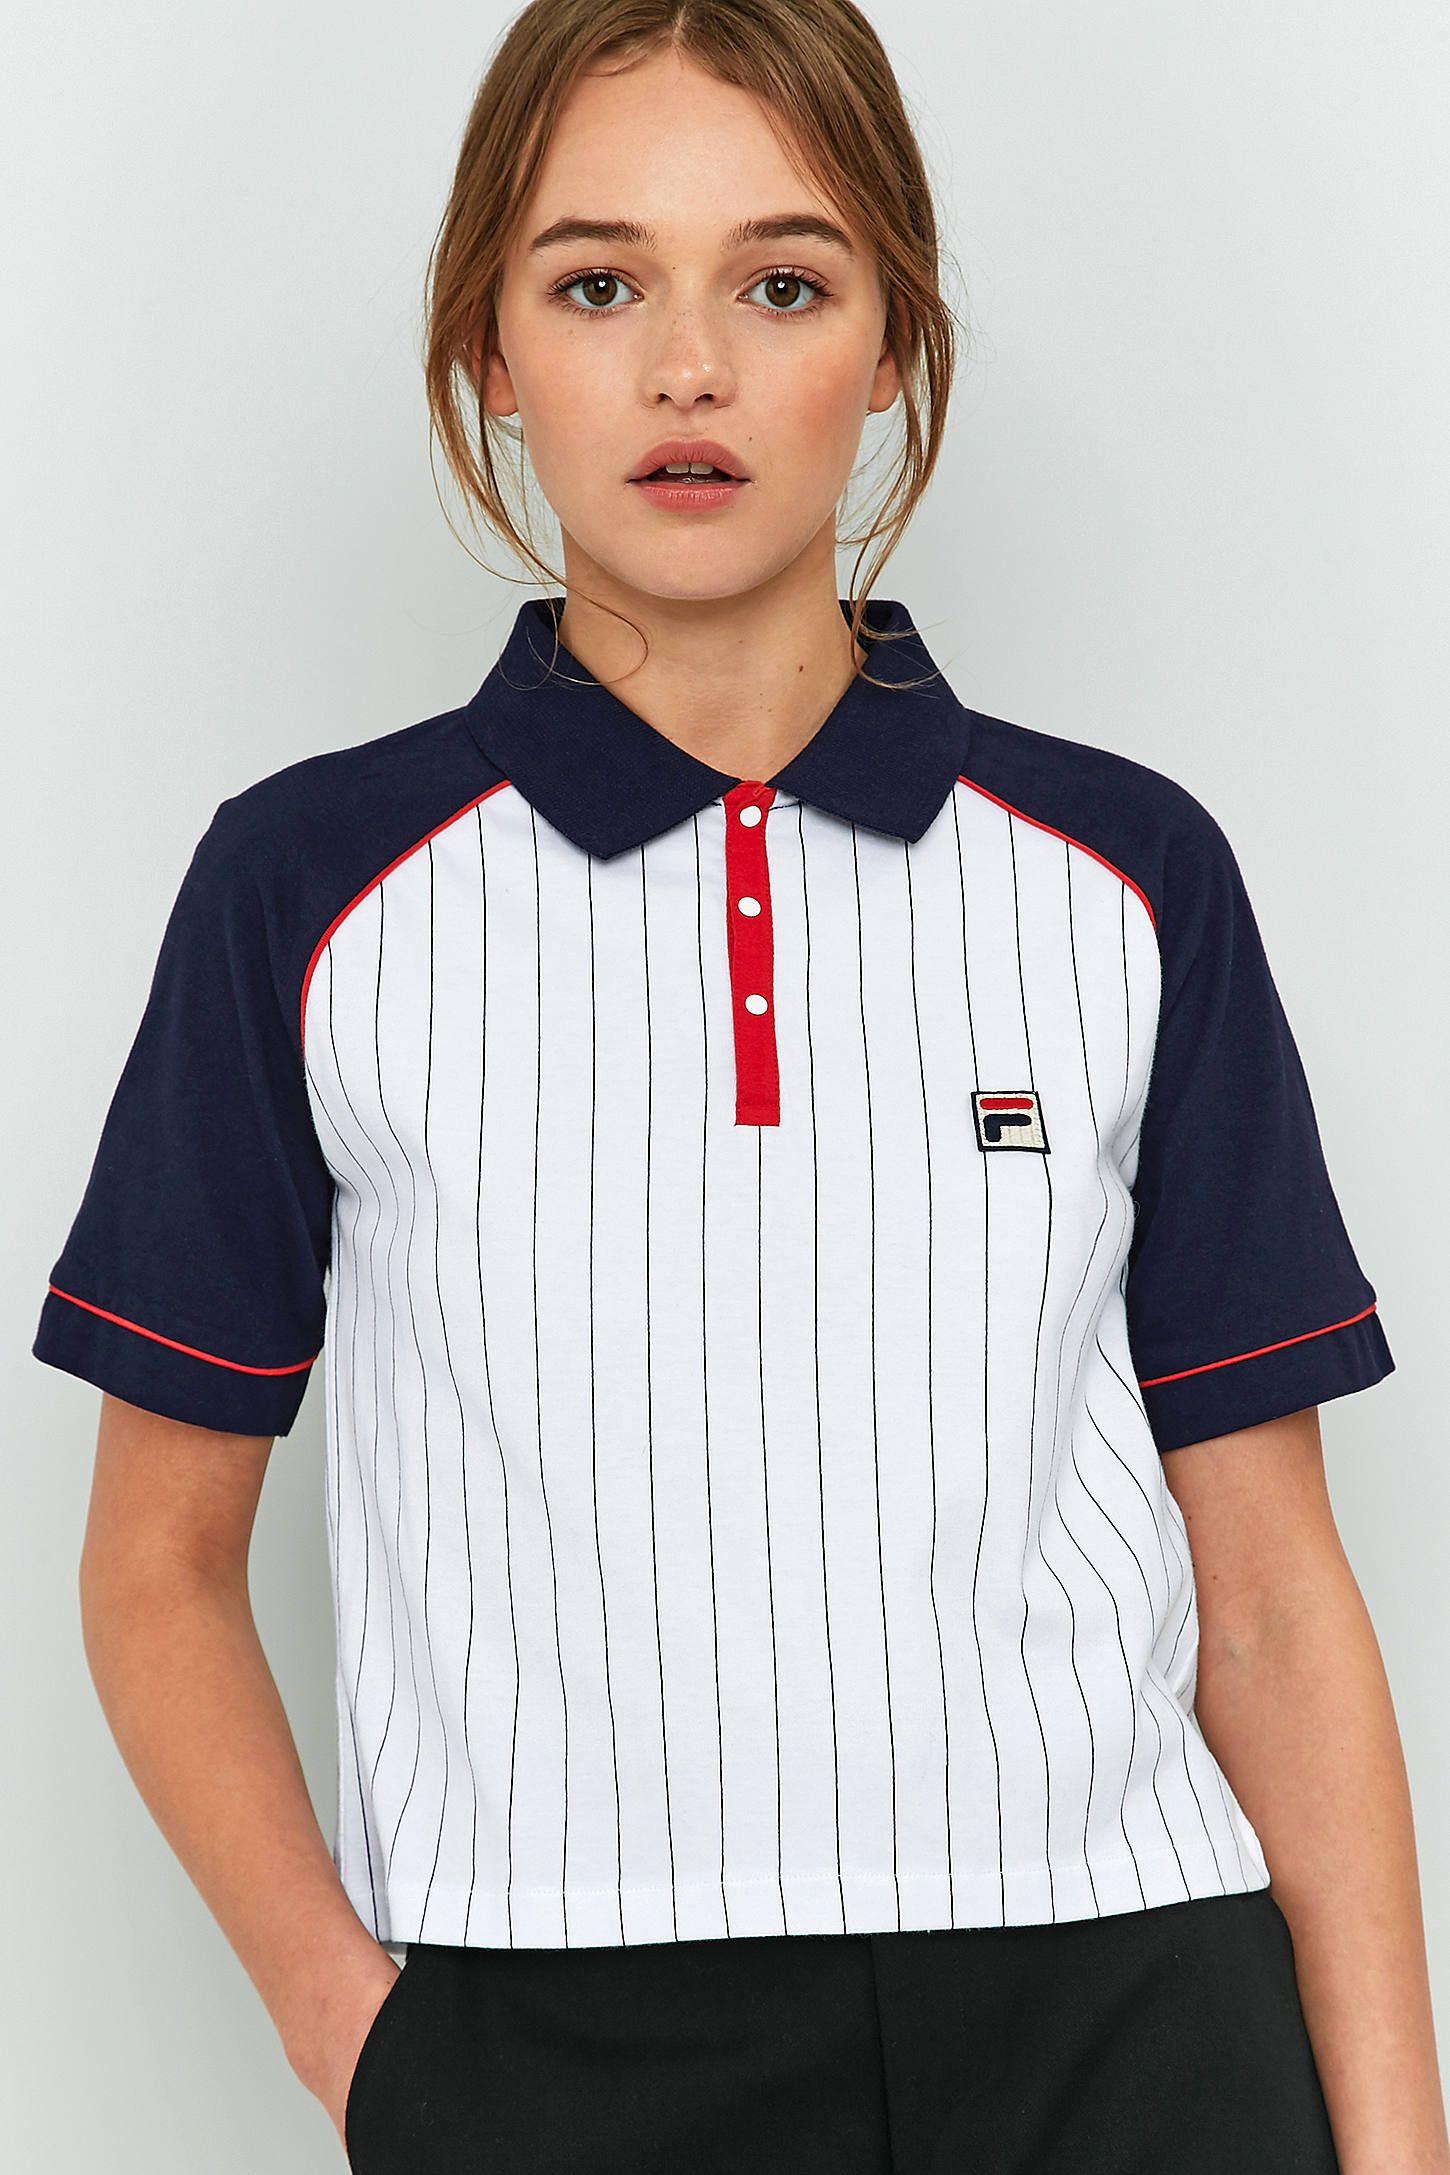 3574e631db79 FILA Carletta Pinstripe Polo Shirt   Outfitz   Fila outfit, Polo ...